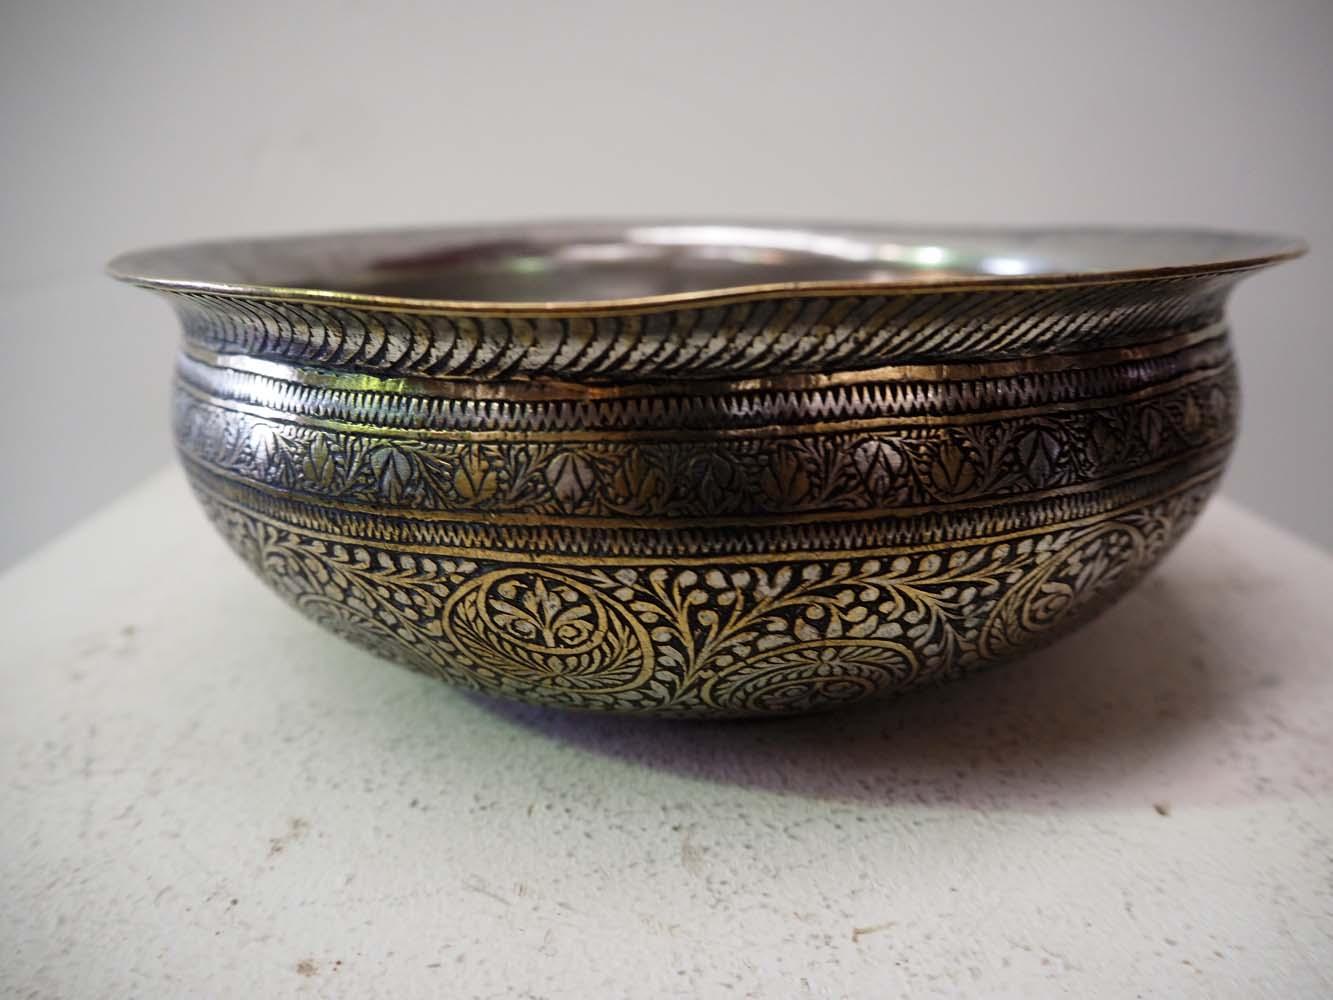 Antique Turkish Ottoman Hamam bowl homeware metal